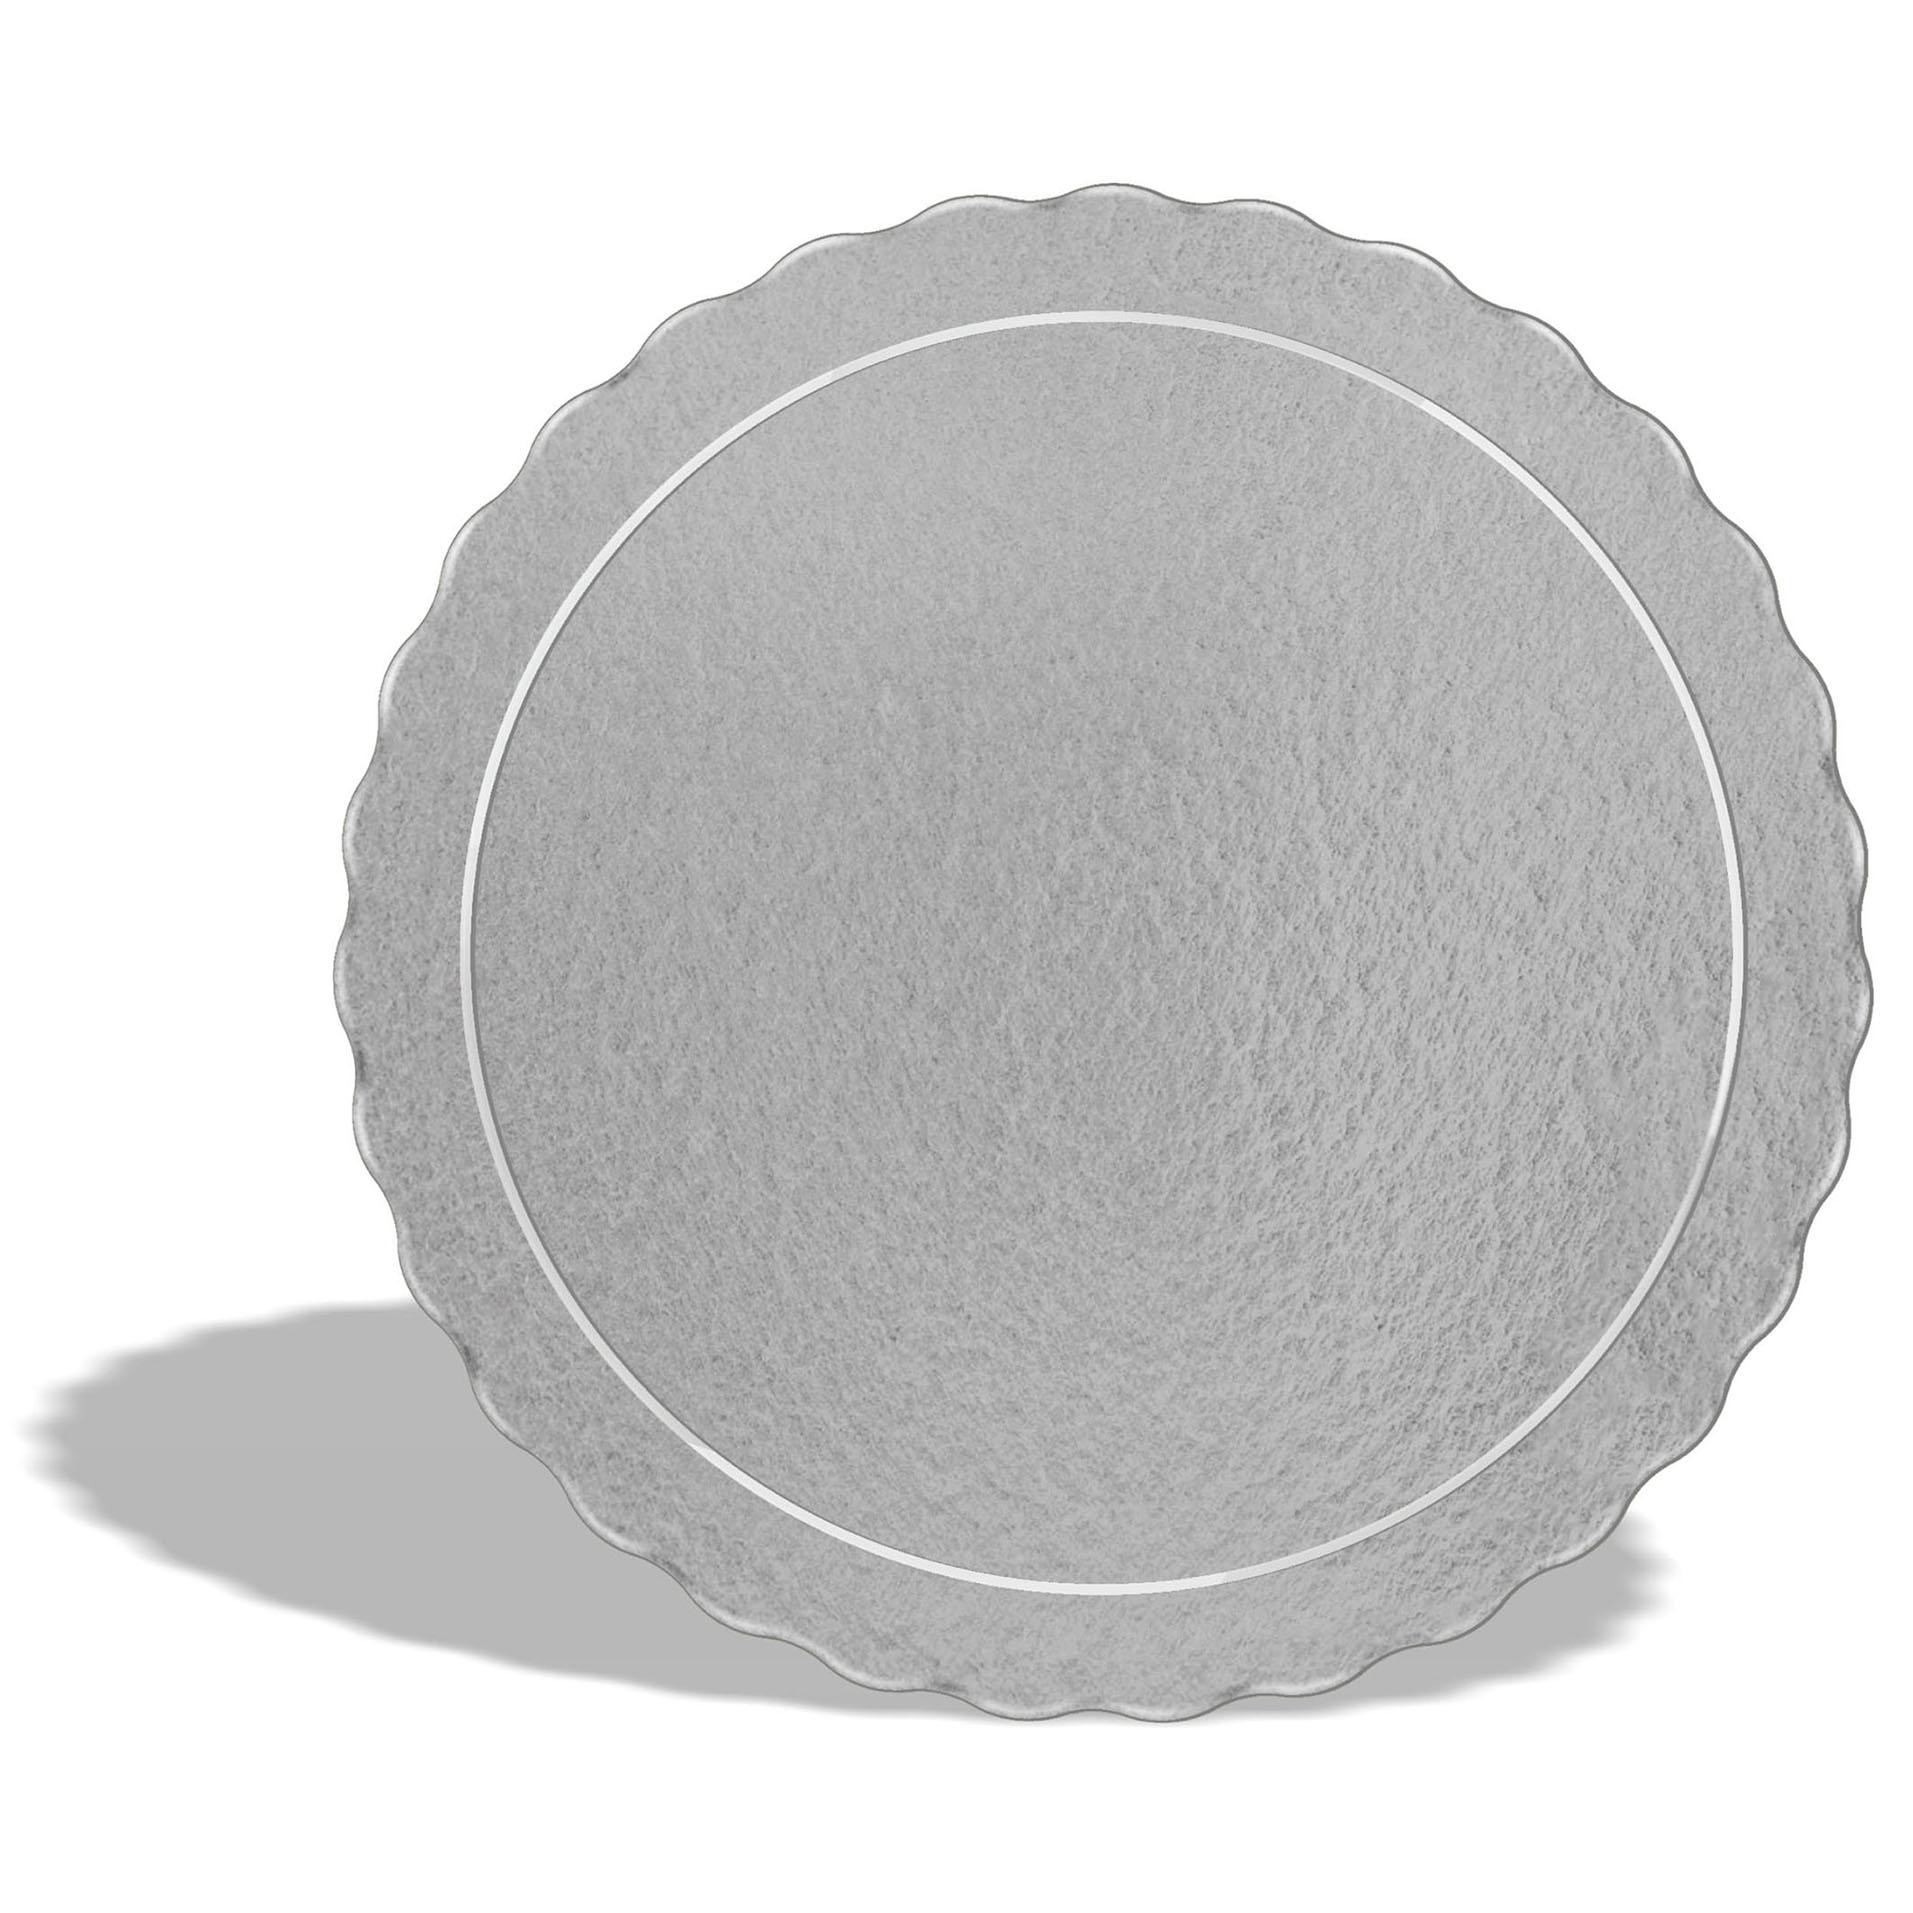 Kit 50 Bases Laminadas Para Bolo, Cake Board, 20 e 30cm - Prata